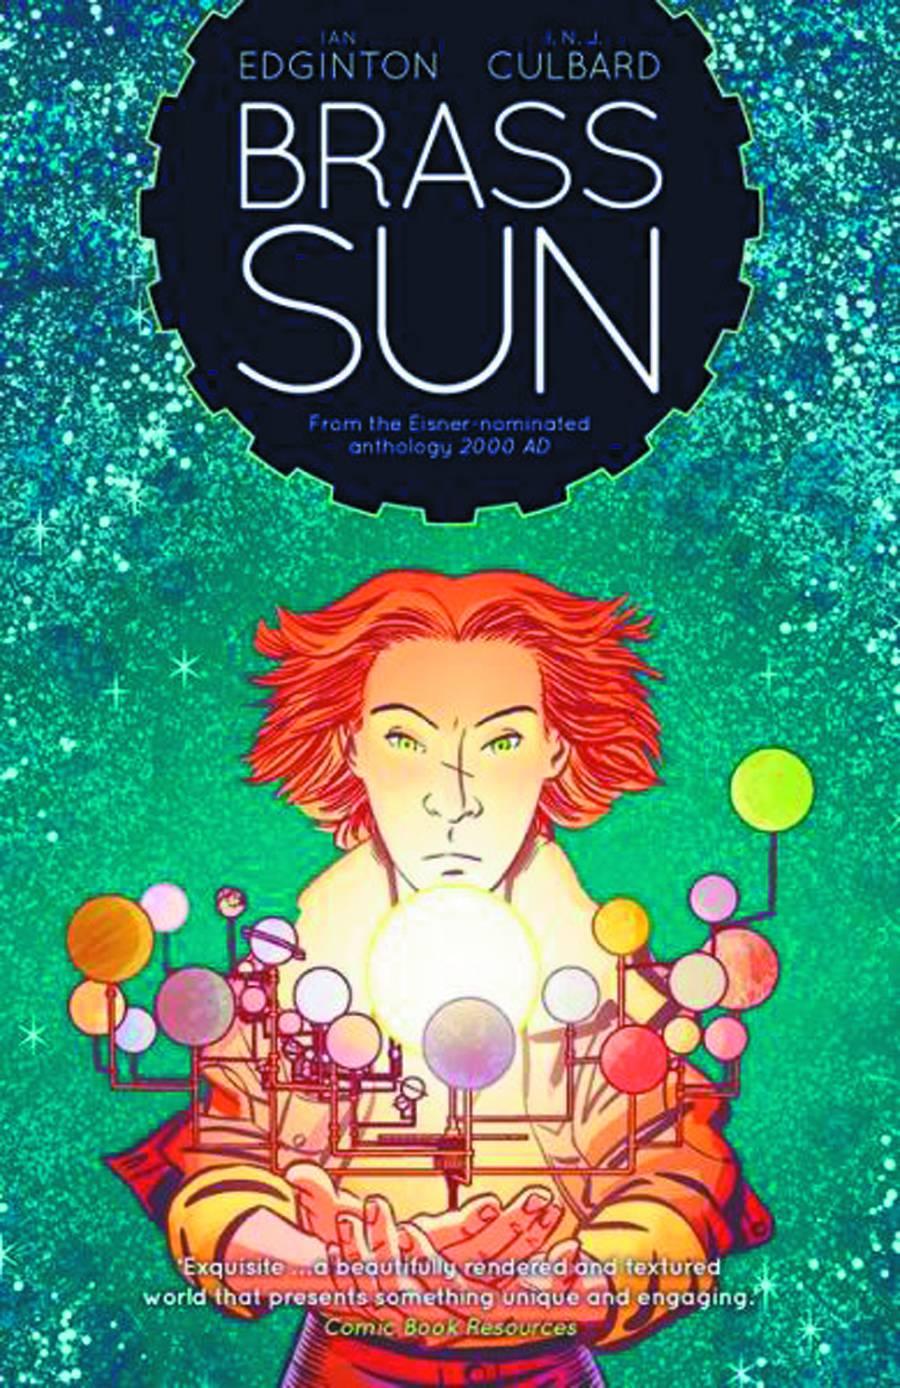 Ian Edginton signing Brass Sun at Forbidden Planet